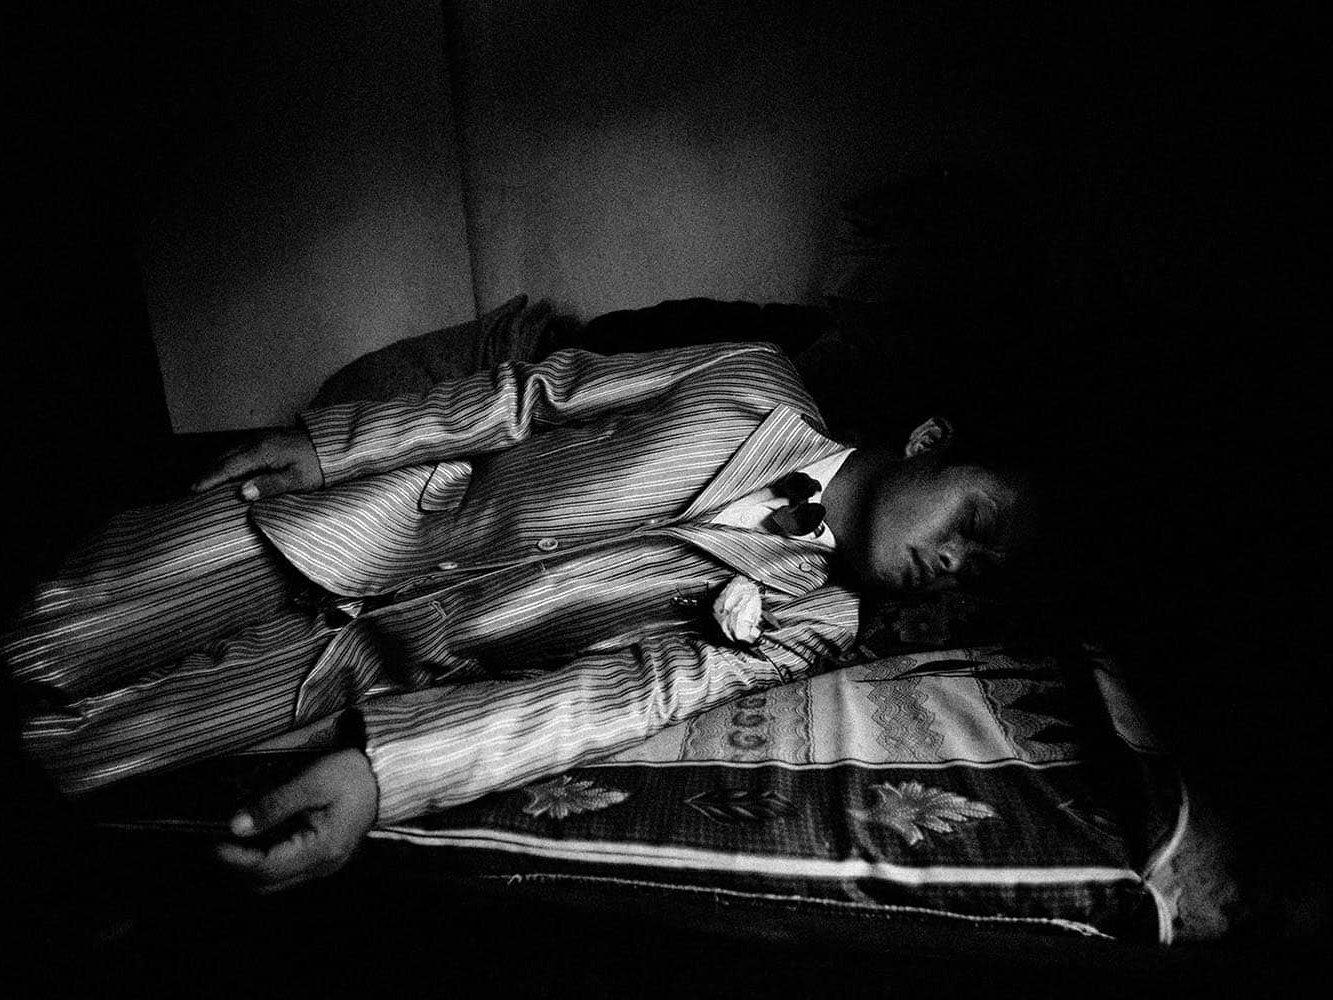 vietnam photographer smallthings binhdang 11